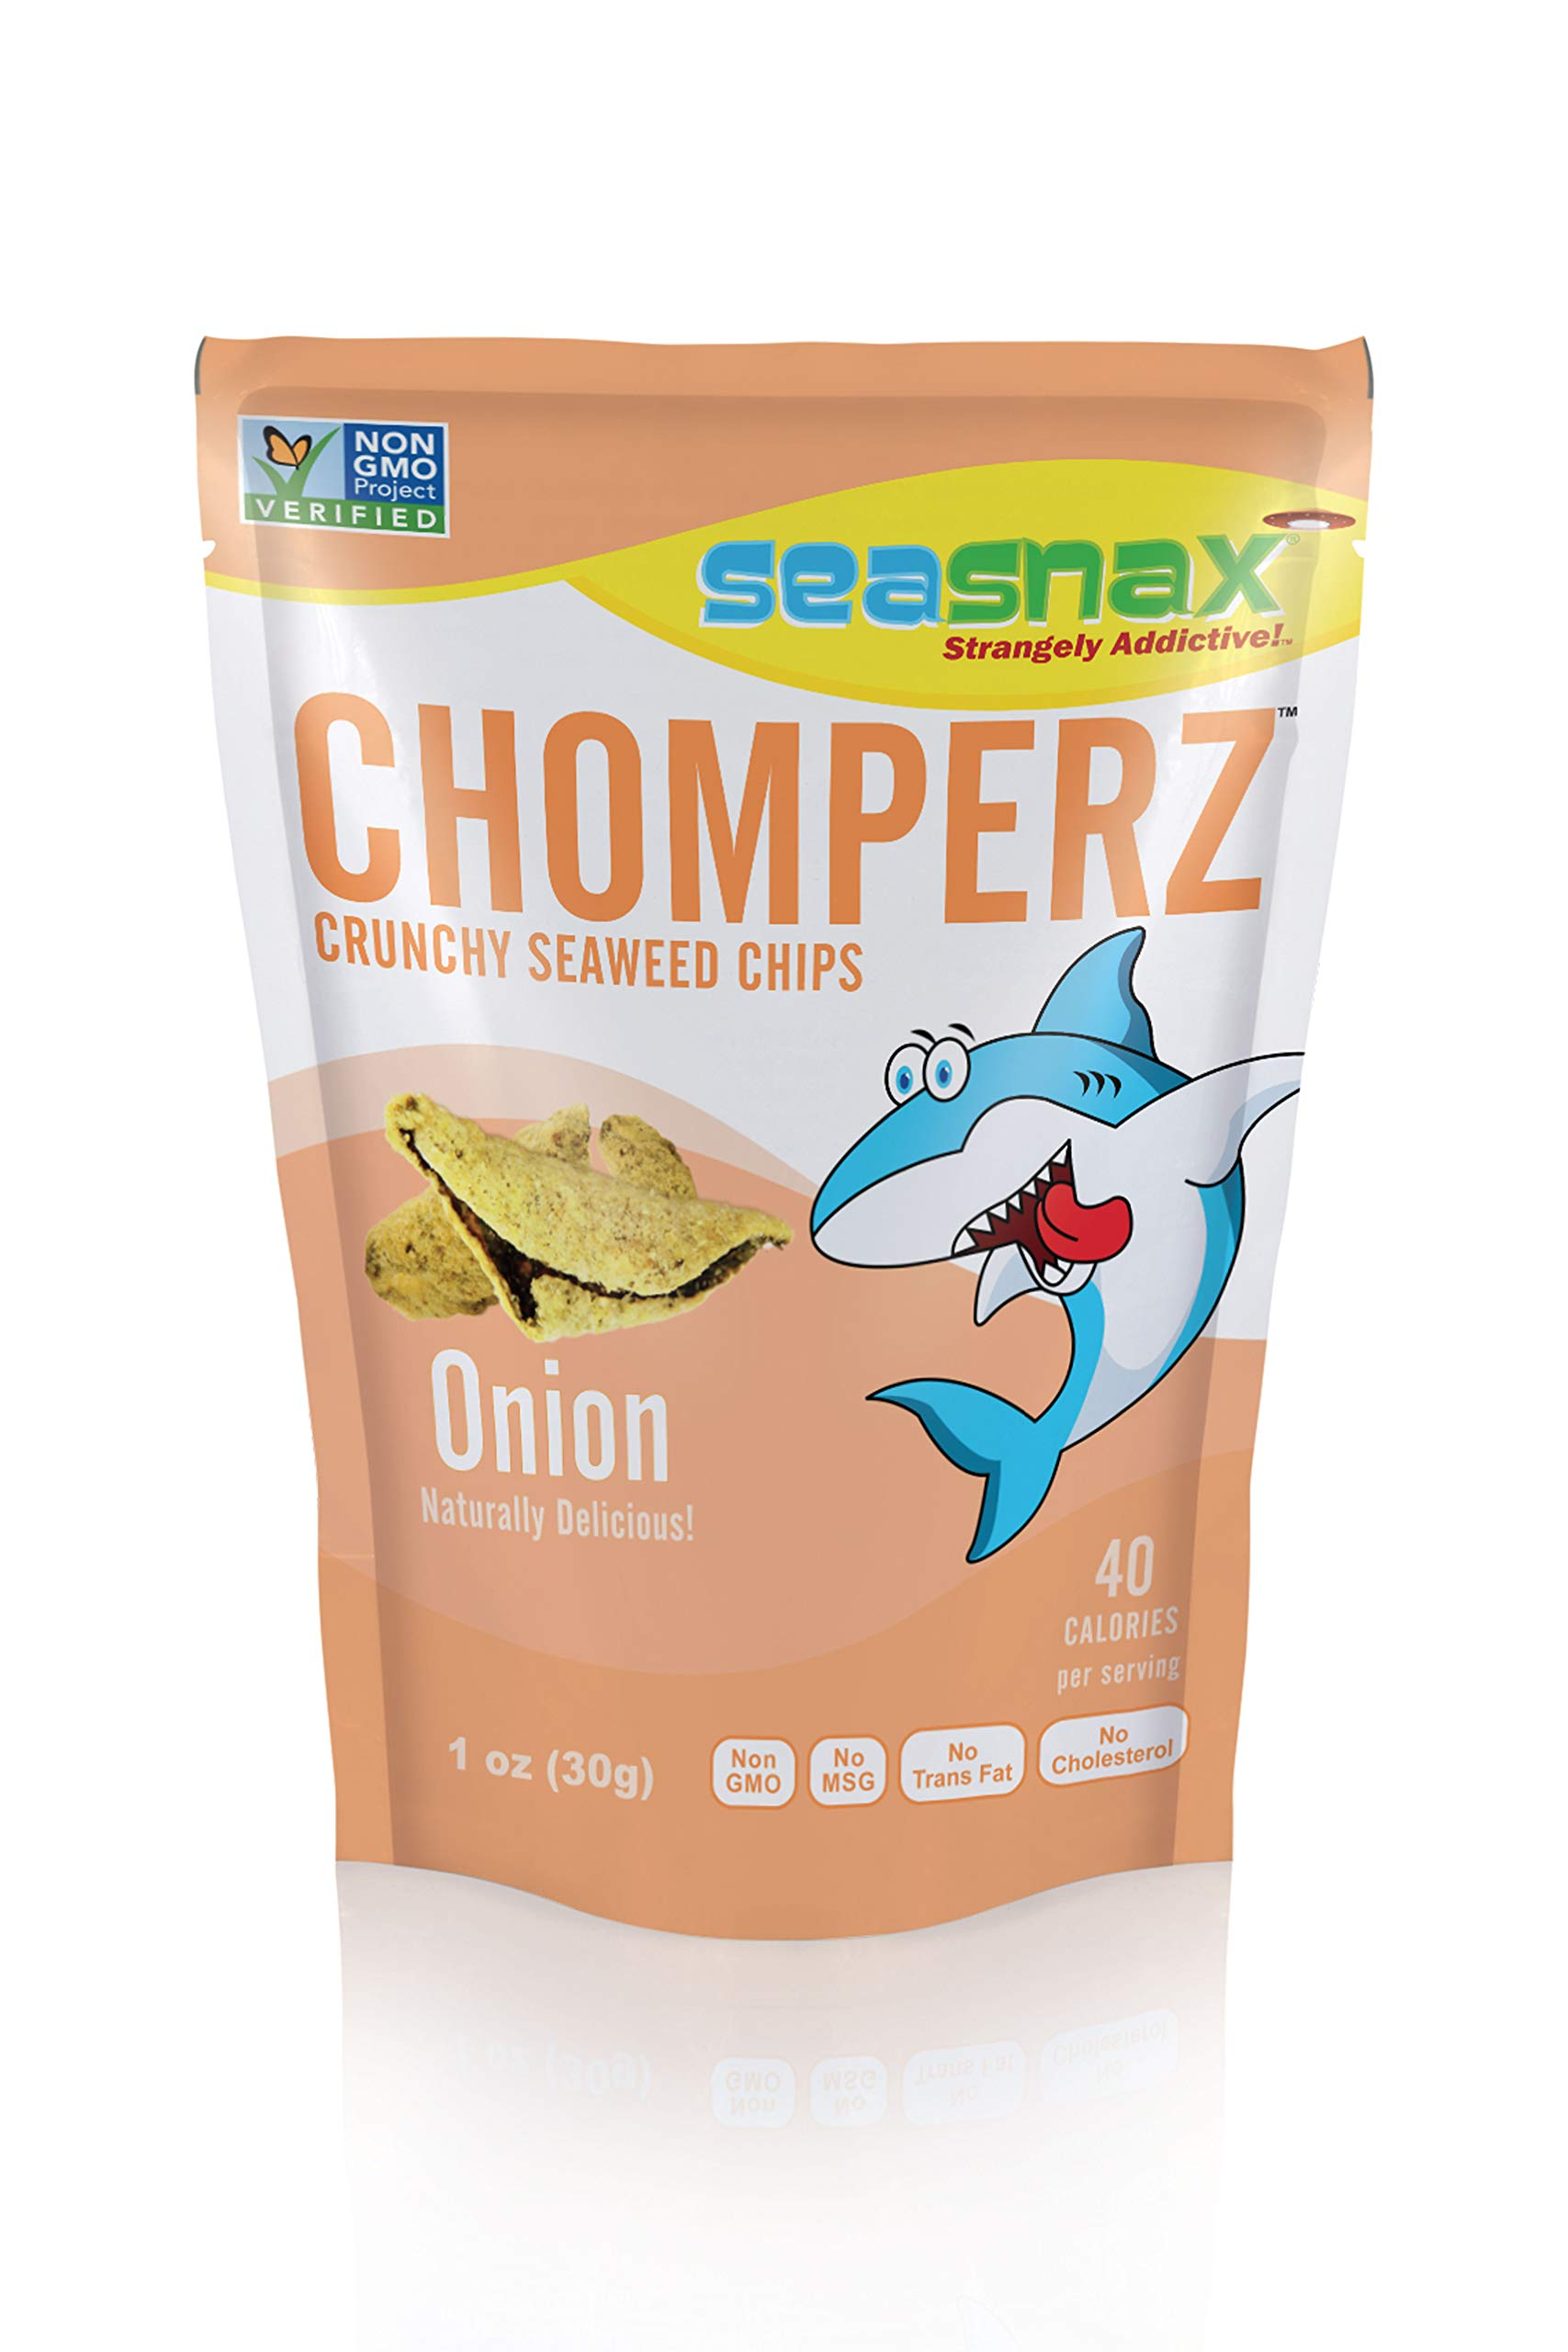 SeaSnax Chomperz Crunchy Seaweed Snacks, Onion 1 Ounce Bag, 8 Count